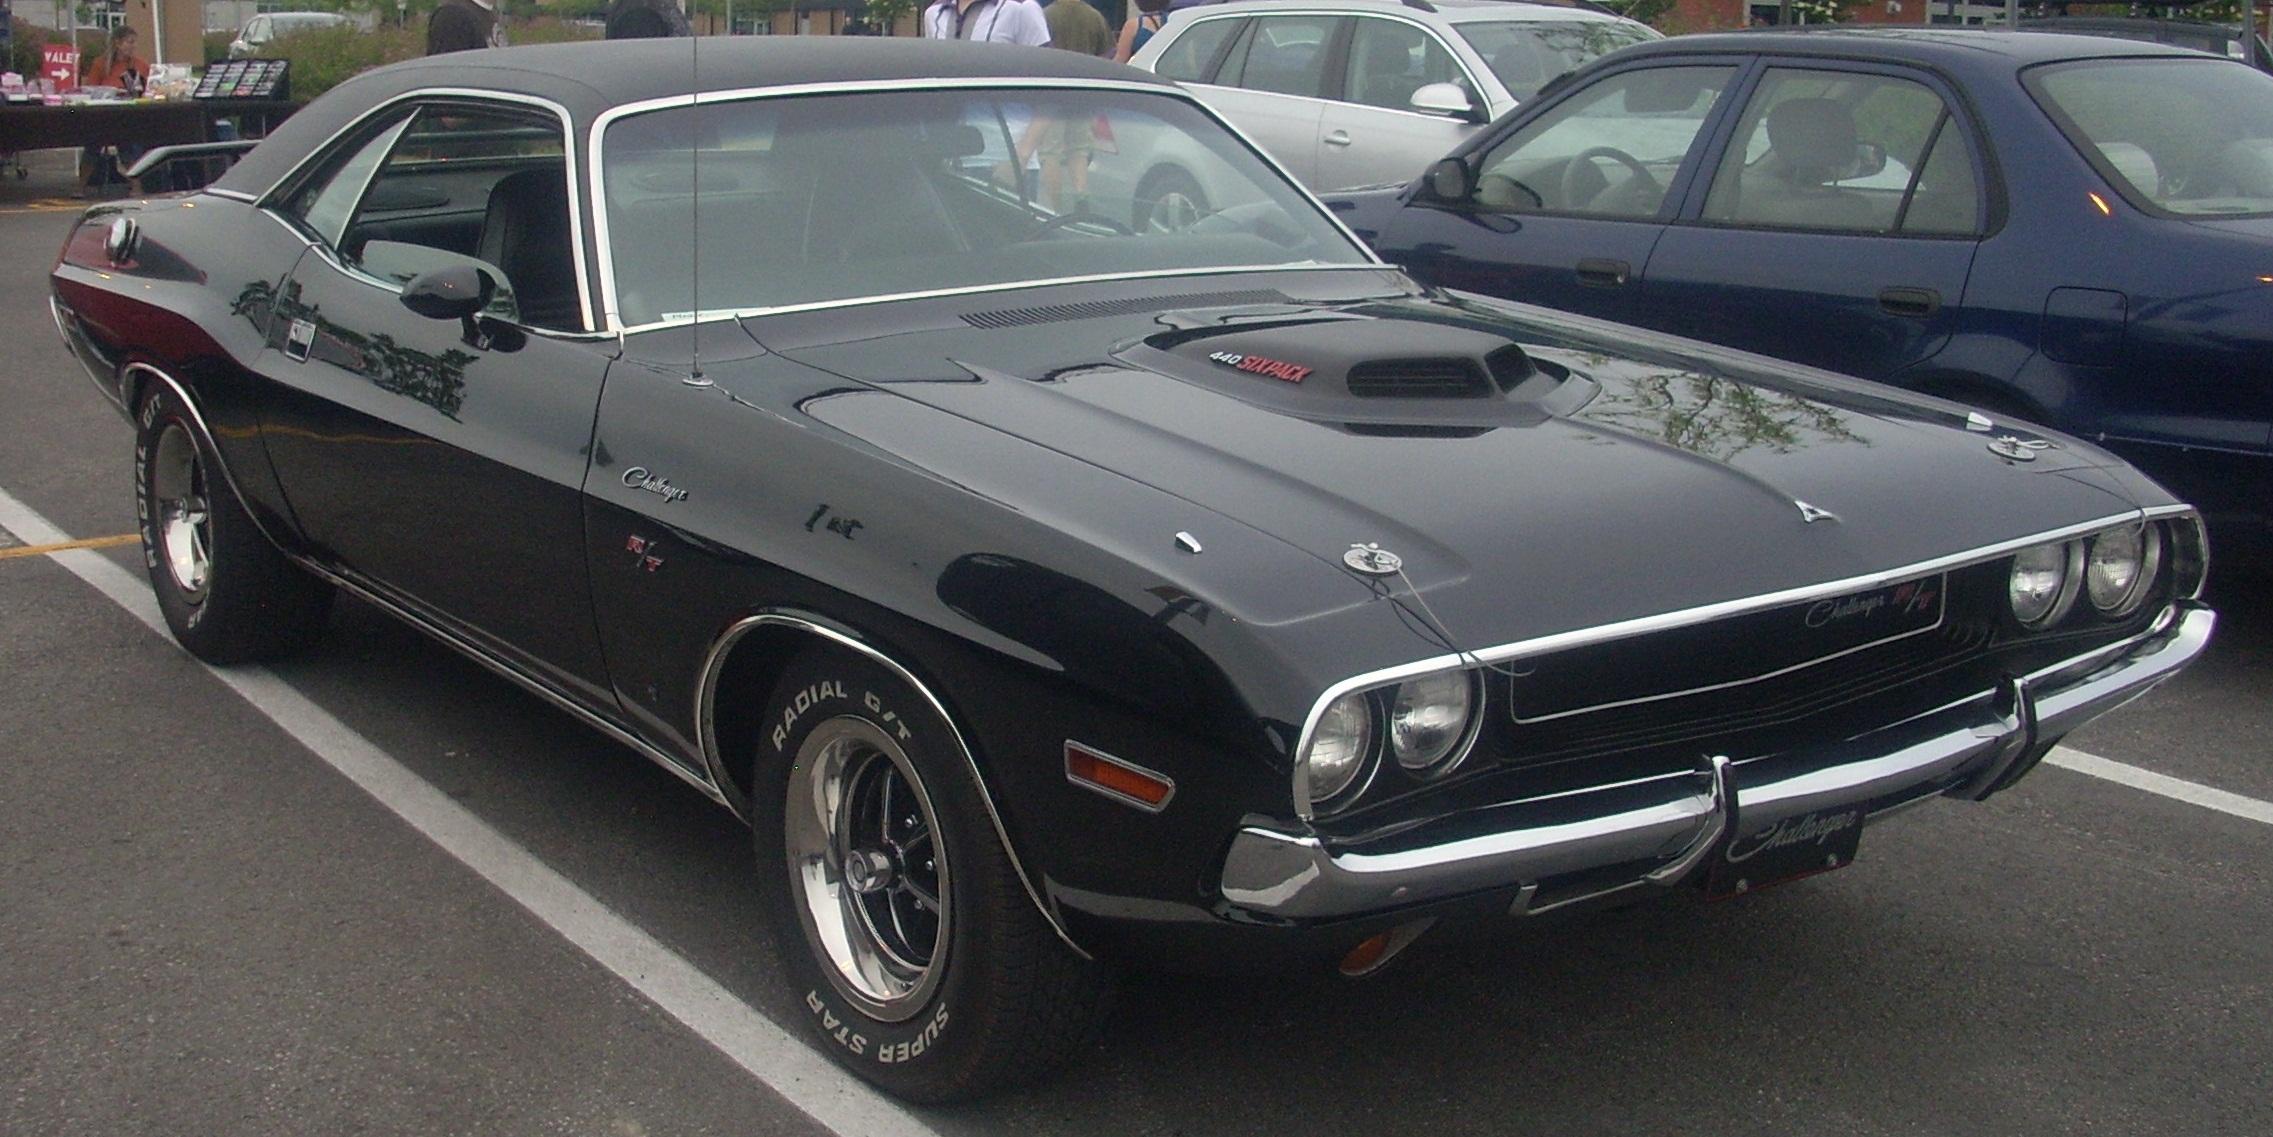 1970 Dodge Challenger R/T, 440 SIX PACK